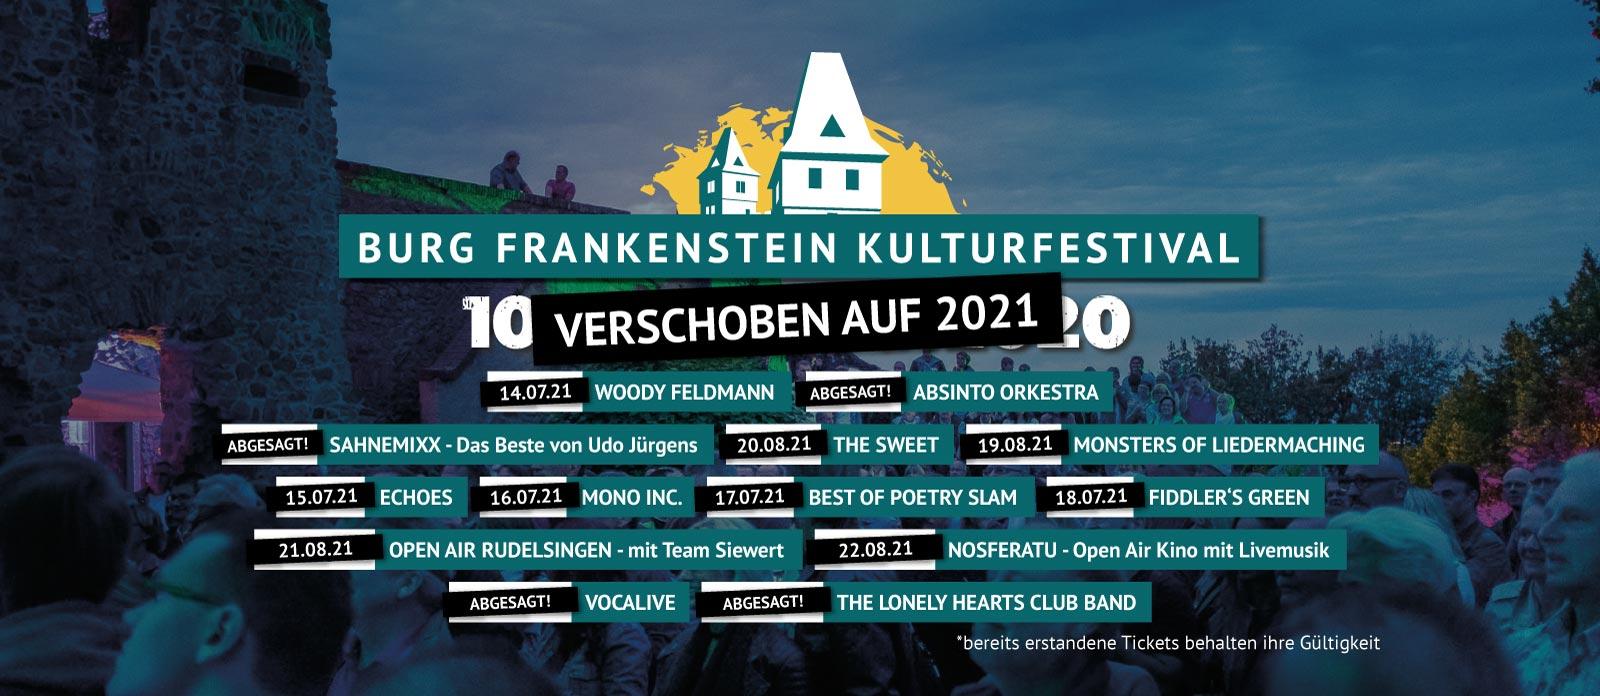 Frankenstein Kulturfestival 2020 verschoben auf 2021